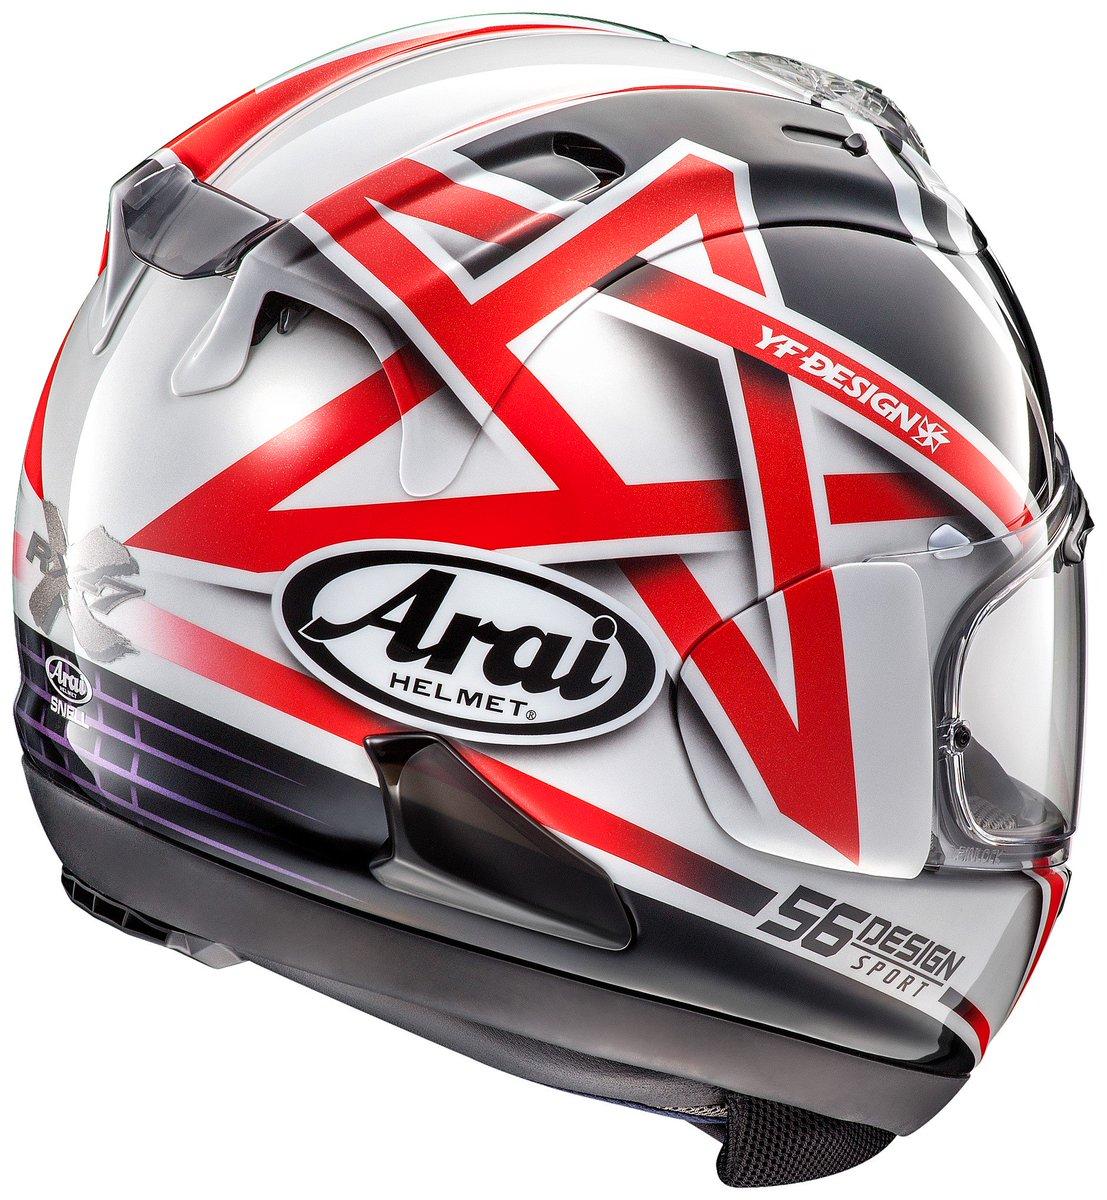 Arai Helmets UK on Twitter